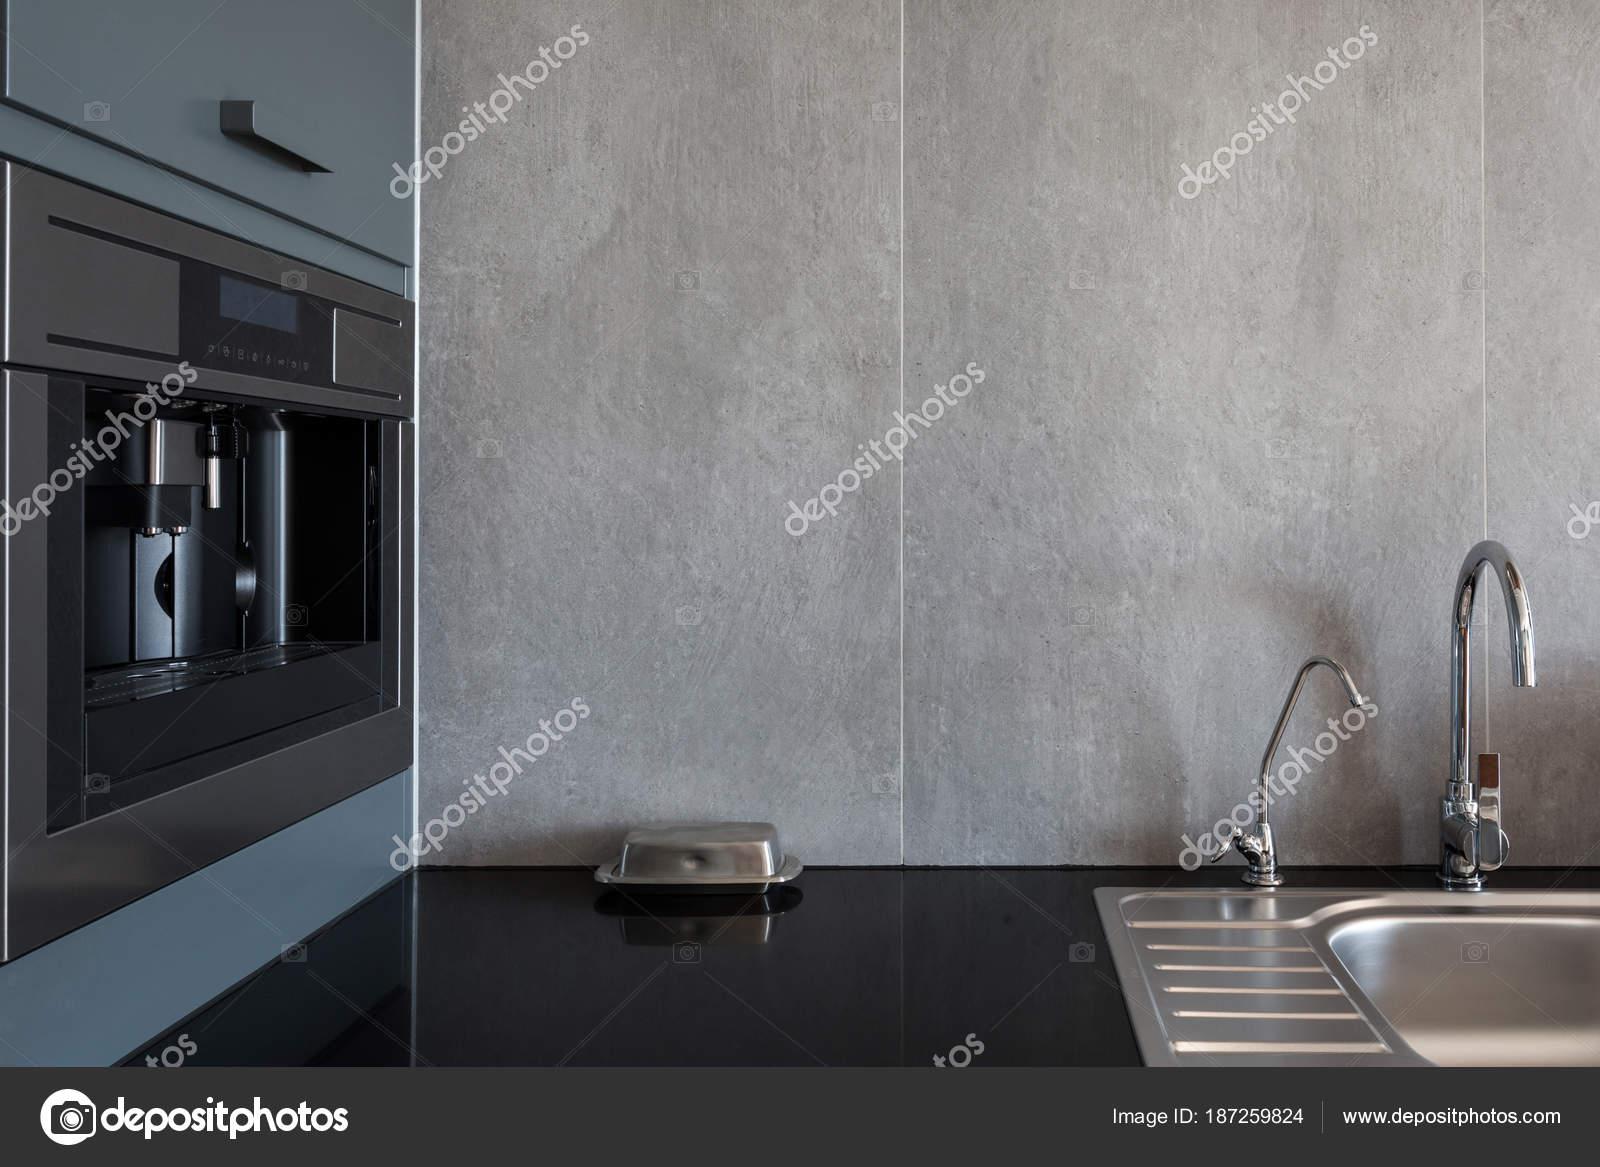 Nieuwe moderne witte keuken met ingebouwde oven chroom water kraan